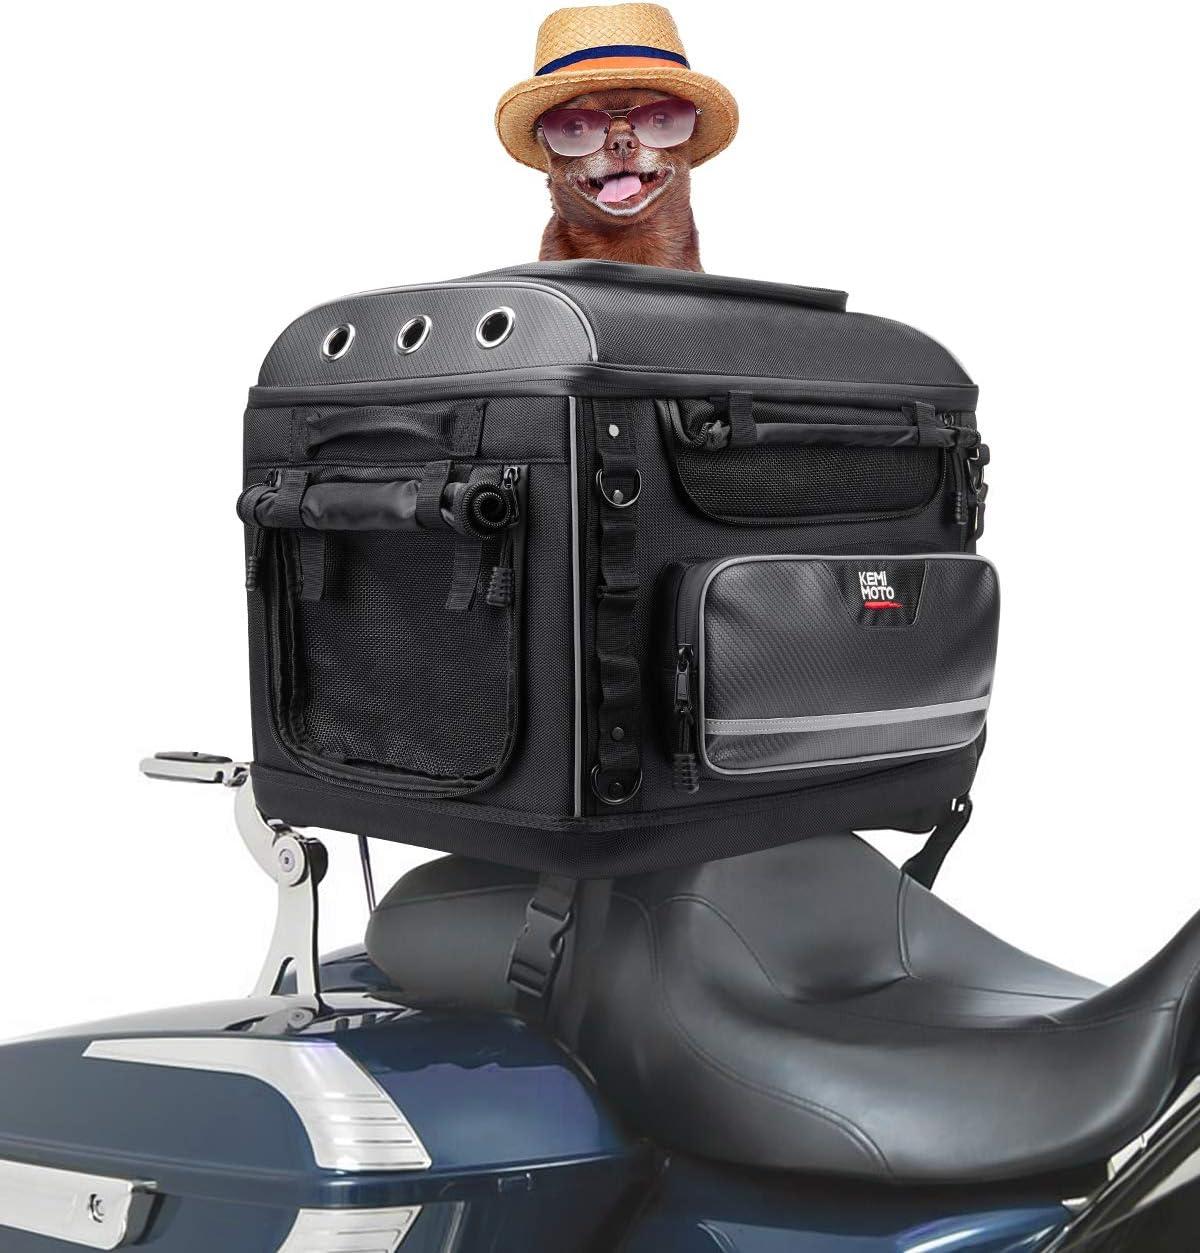 kemimoto Motorcycle Dog//Cat Carrier Bag Pet Voyager for Street Glide Road King with Passenger Seat Sissy Bar or Luggage Rack Touring Trike Models